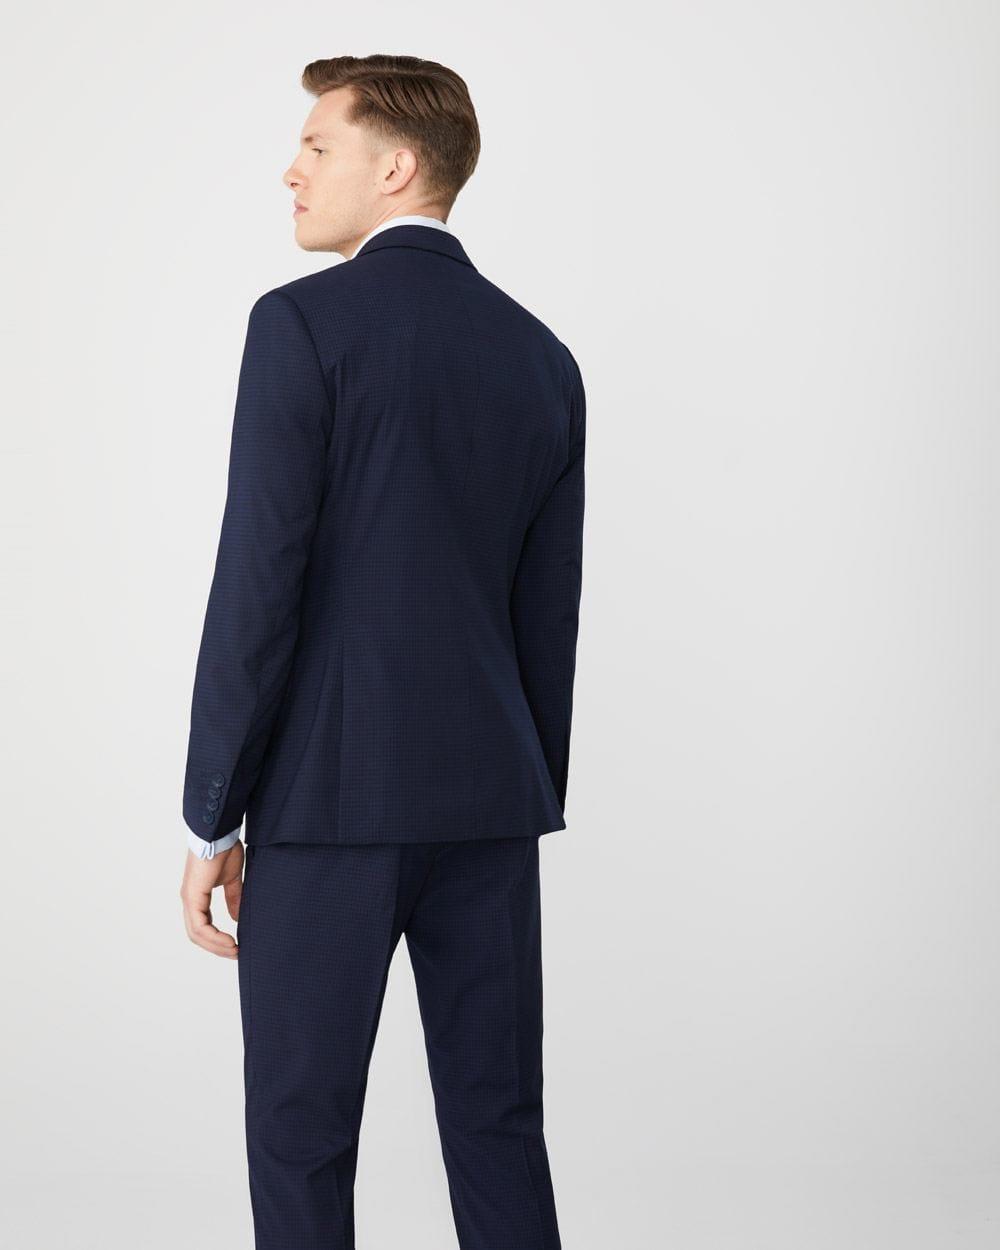 041057f9 Slim fit two-tone Navy suit blazer - Tall | RW&CO.